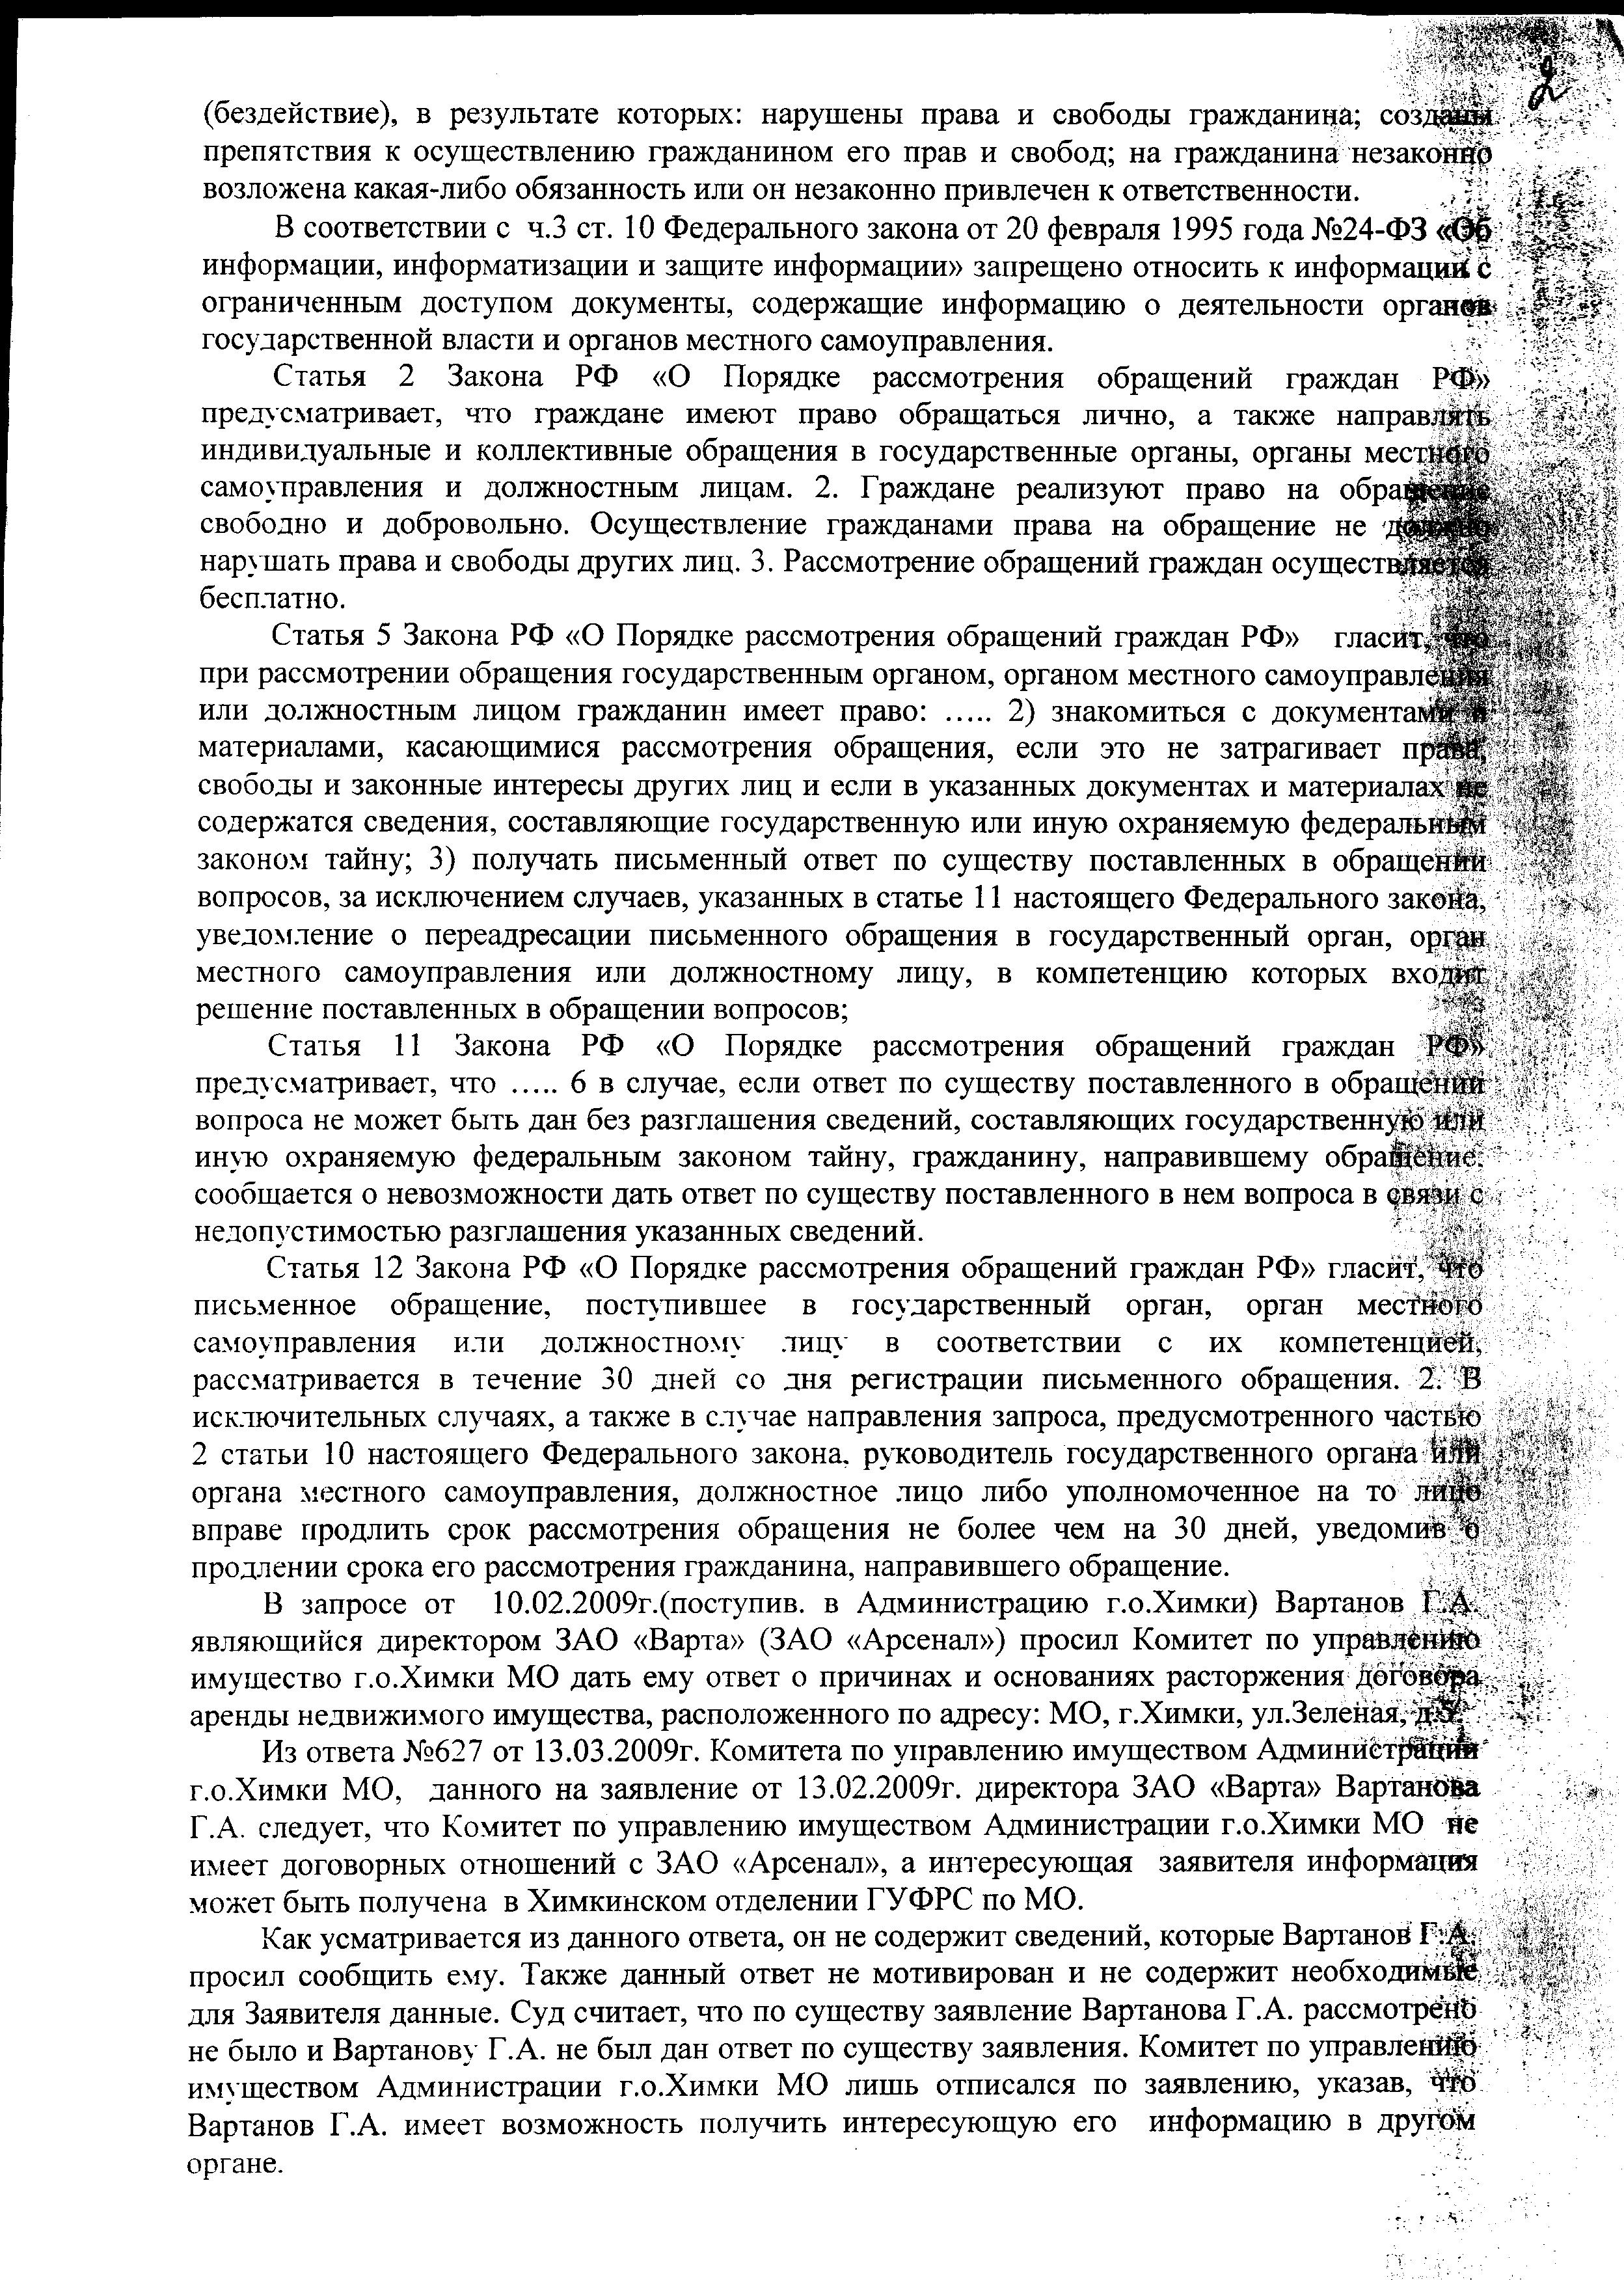 2 лист суда с КУИ Сканер